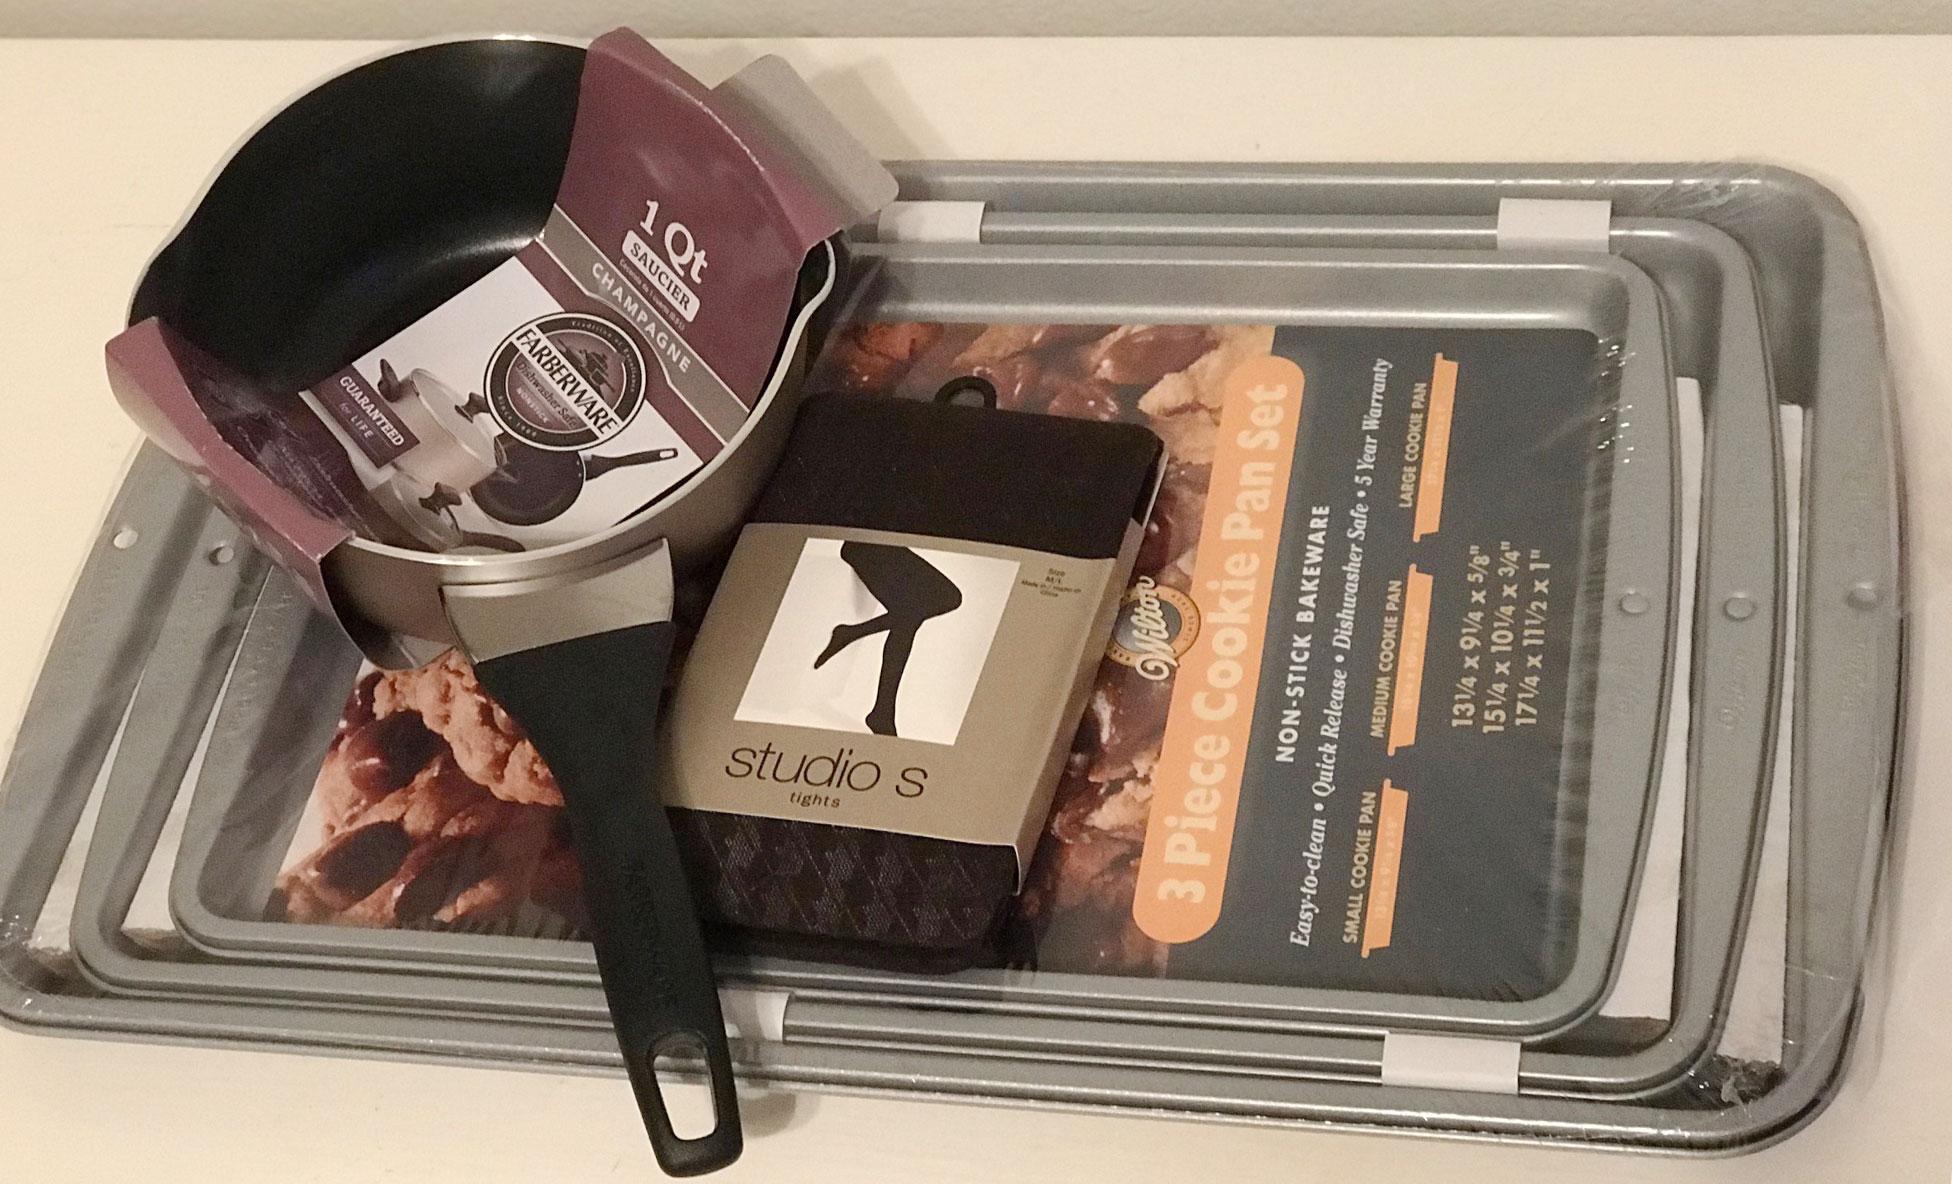 cookie sheets, studio s leggings, and a 1-quart pan